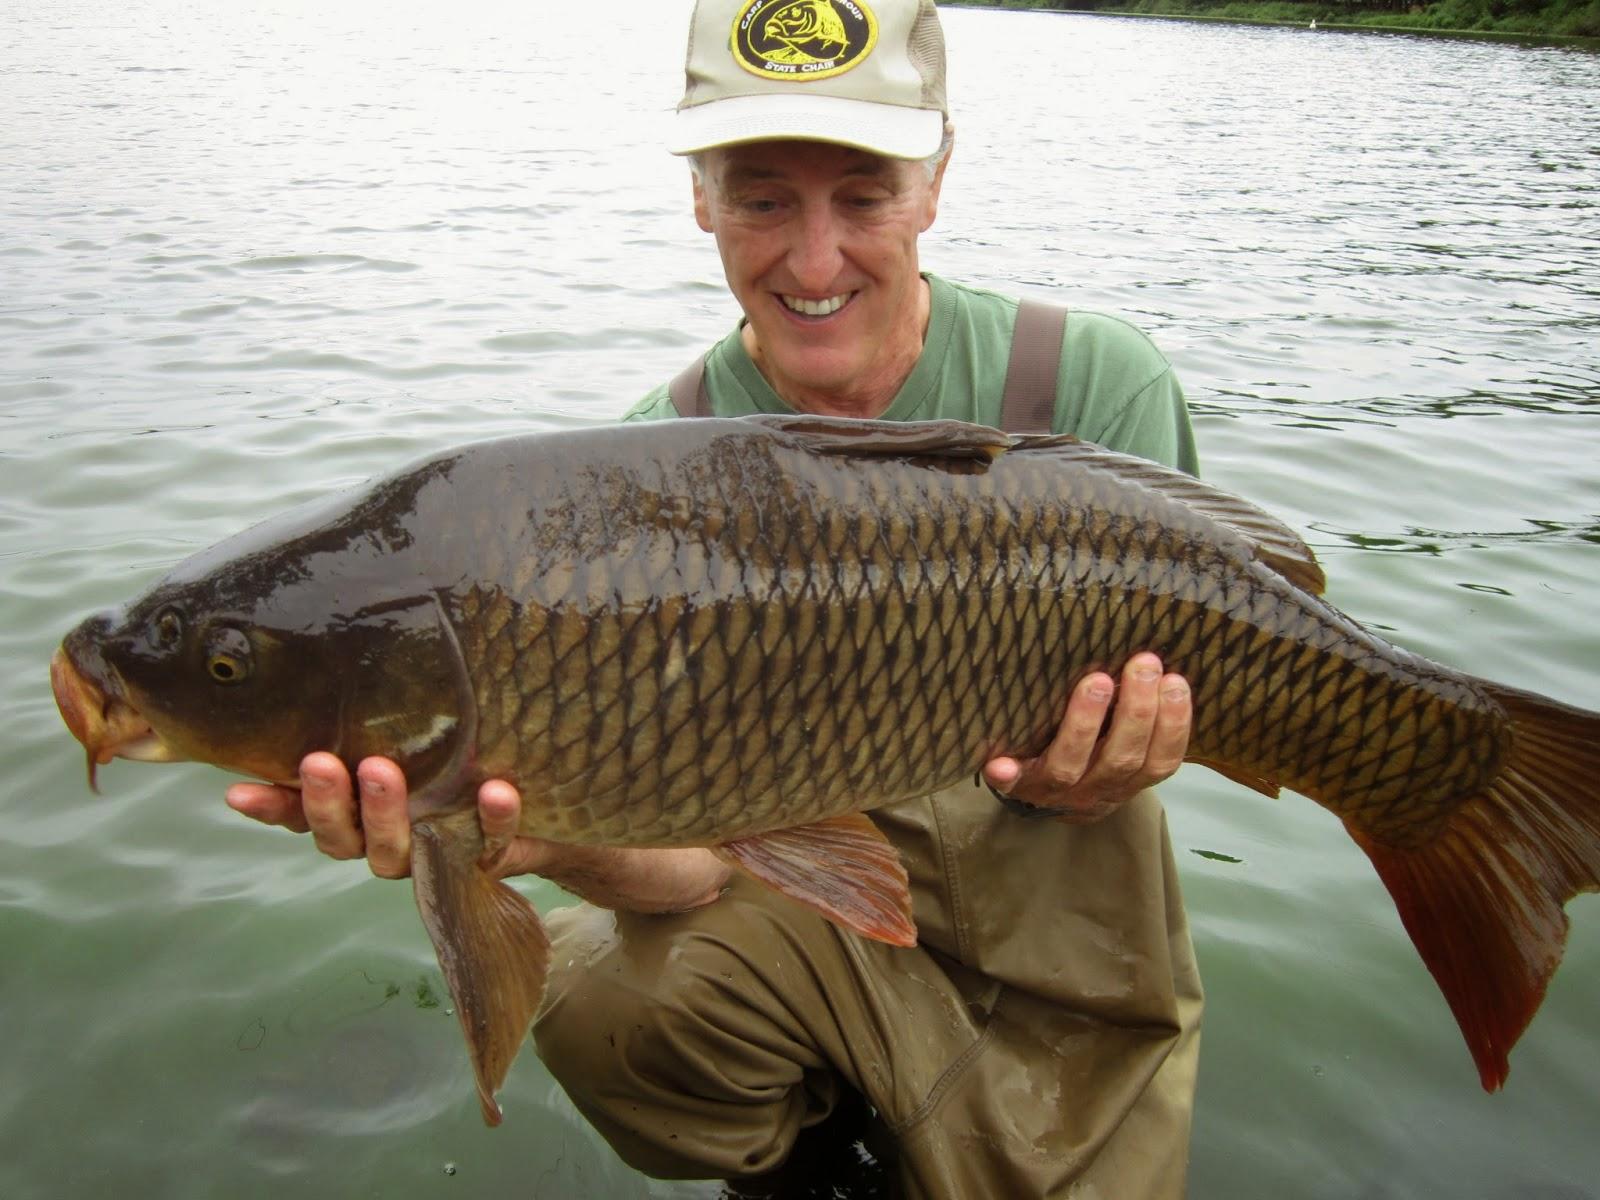 Ri striped bass fishing well possible!